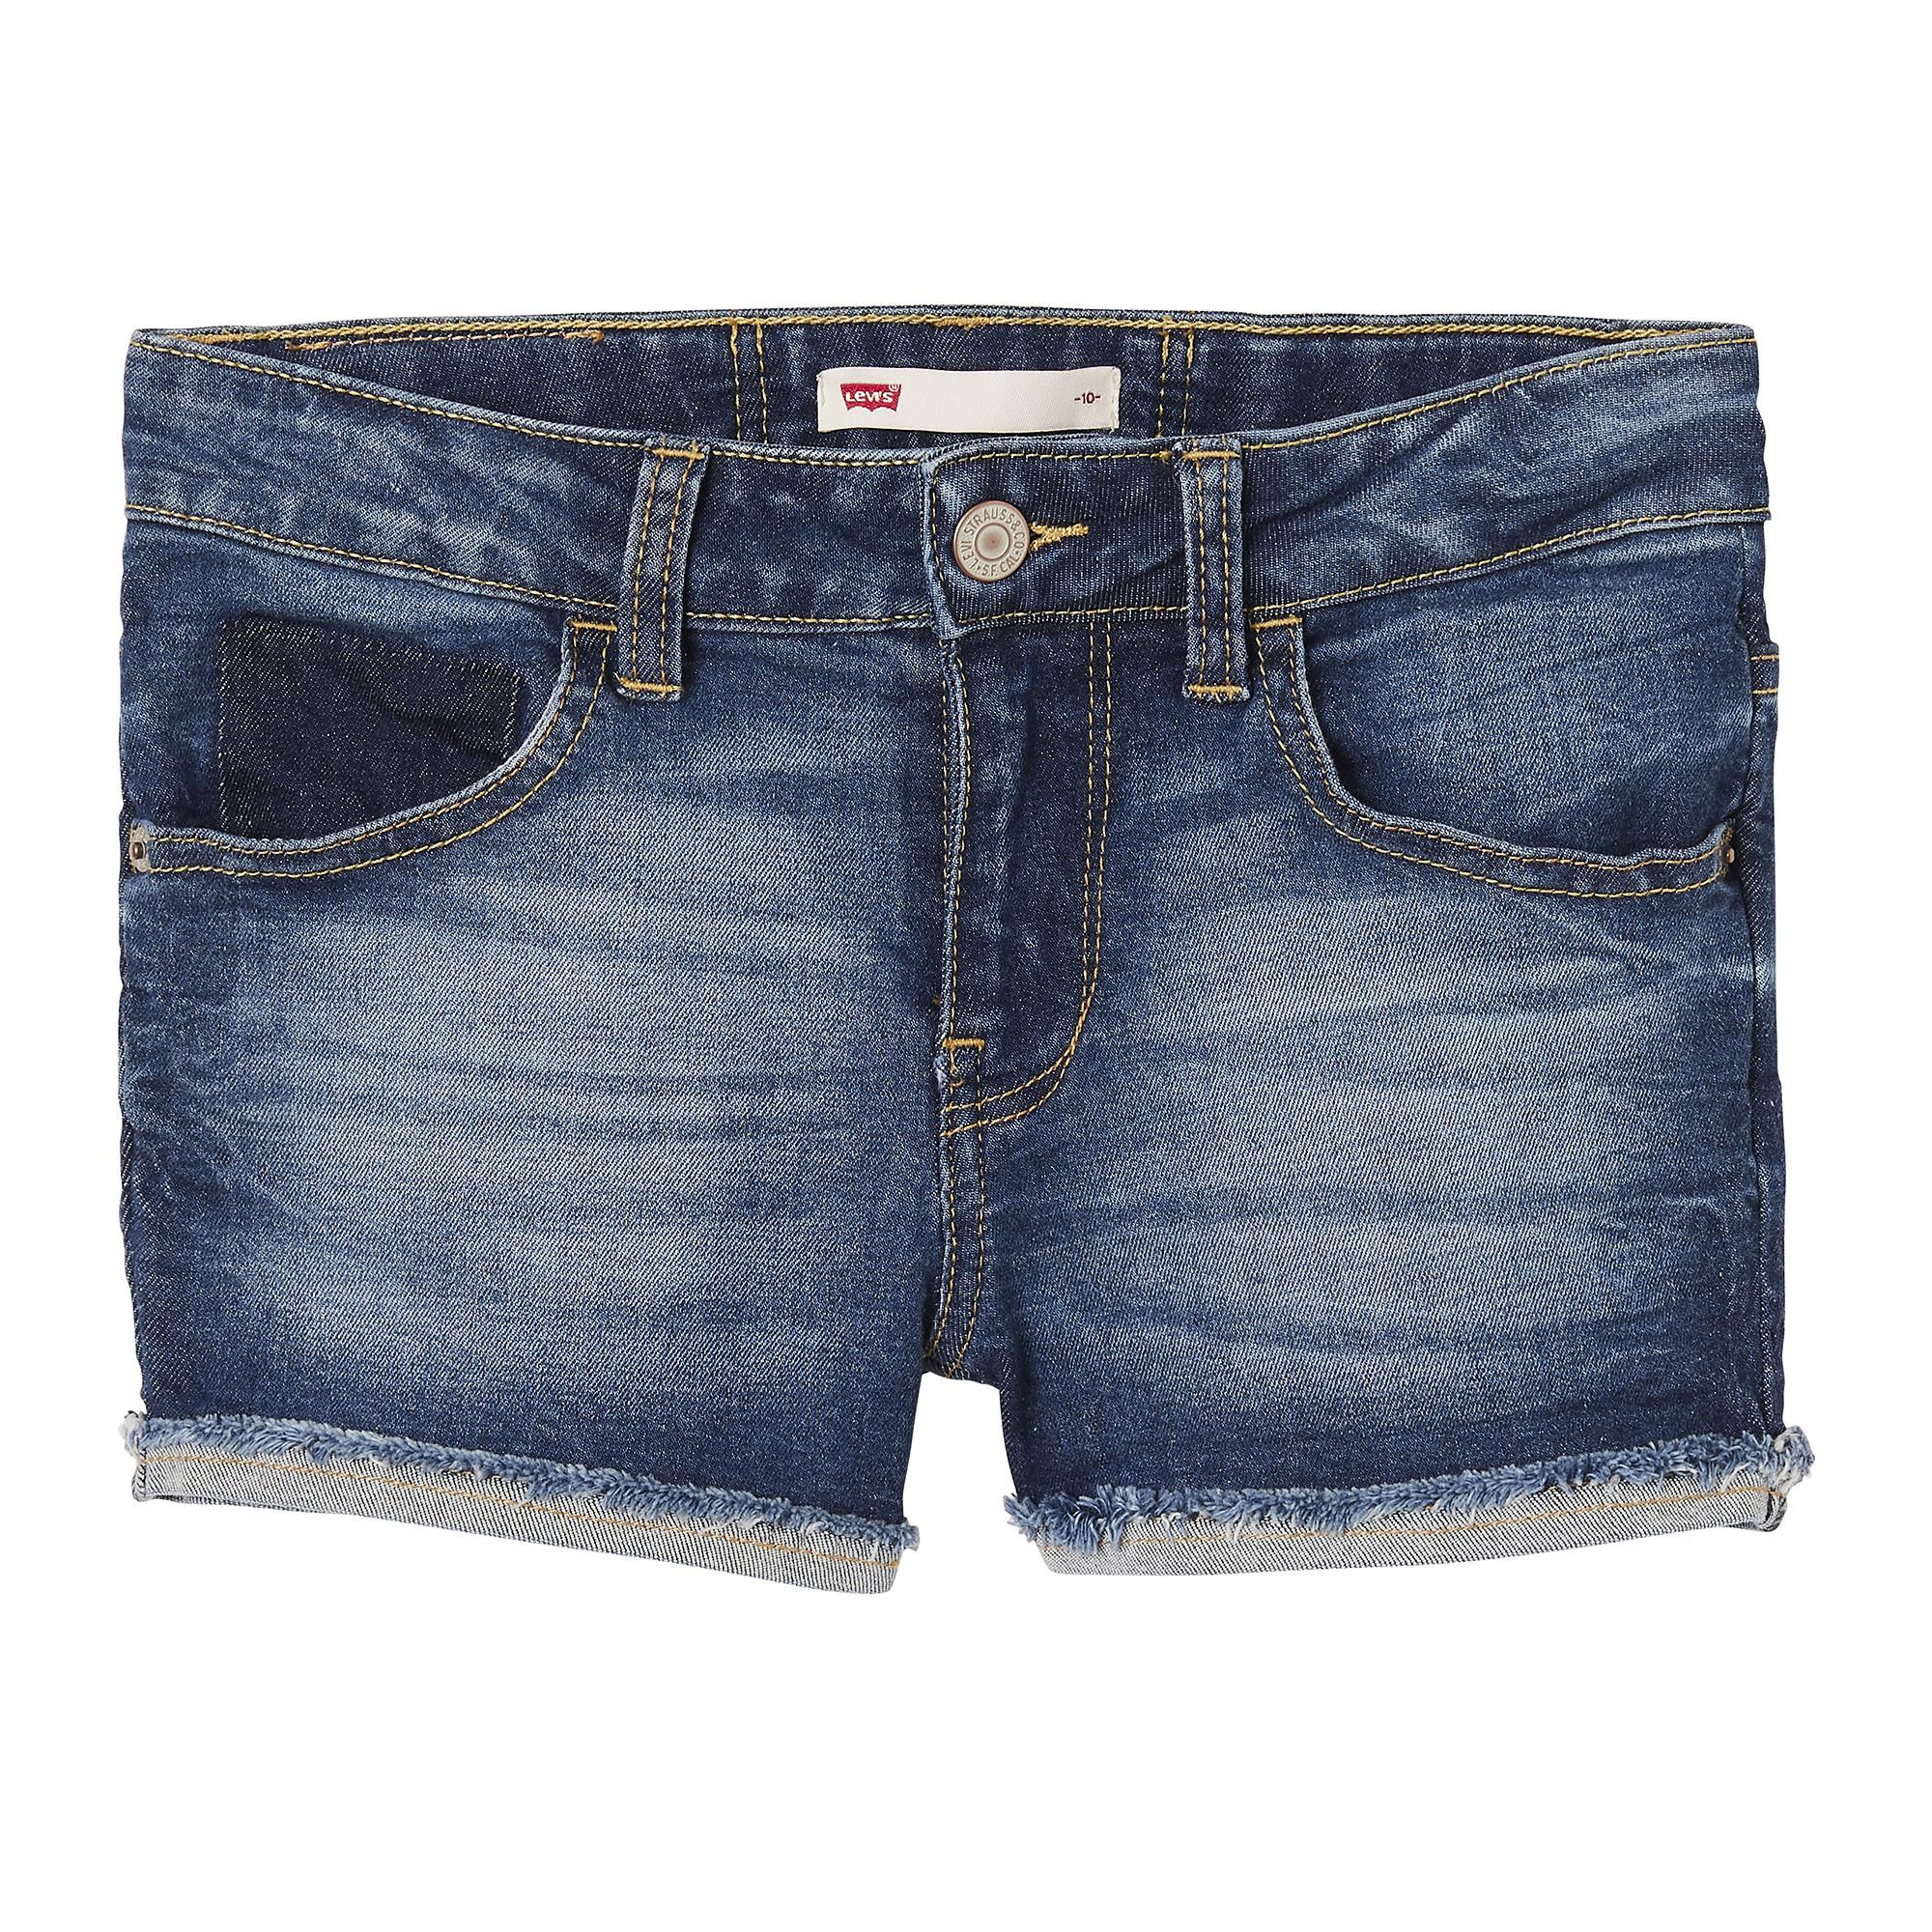 Levi's Moldu Short